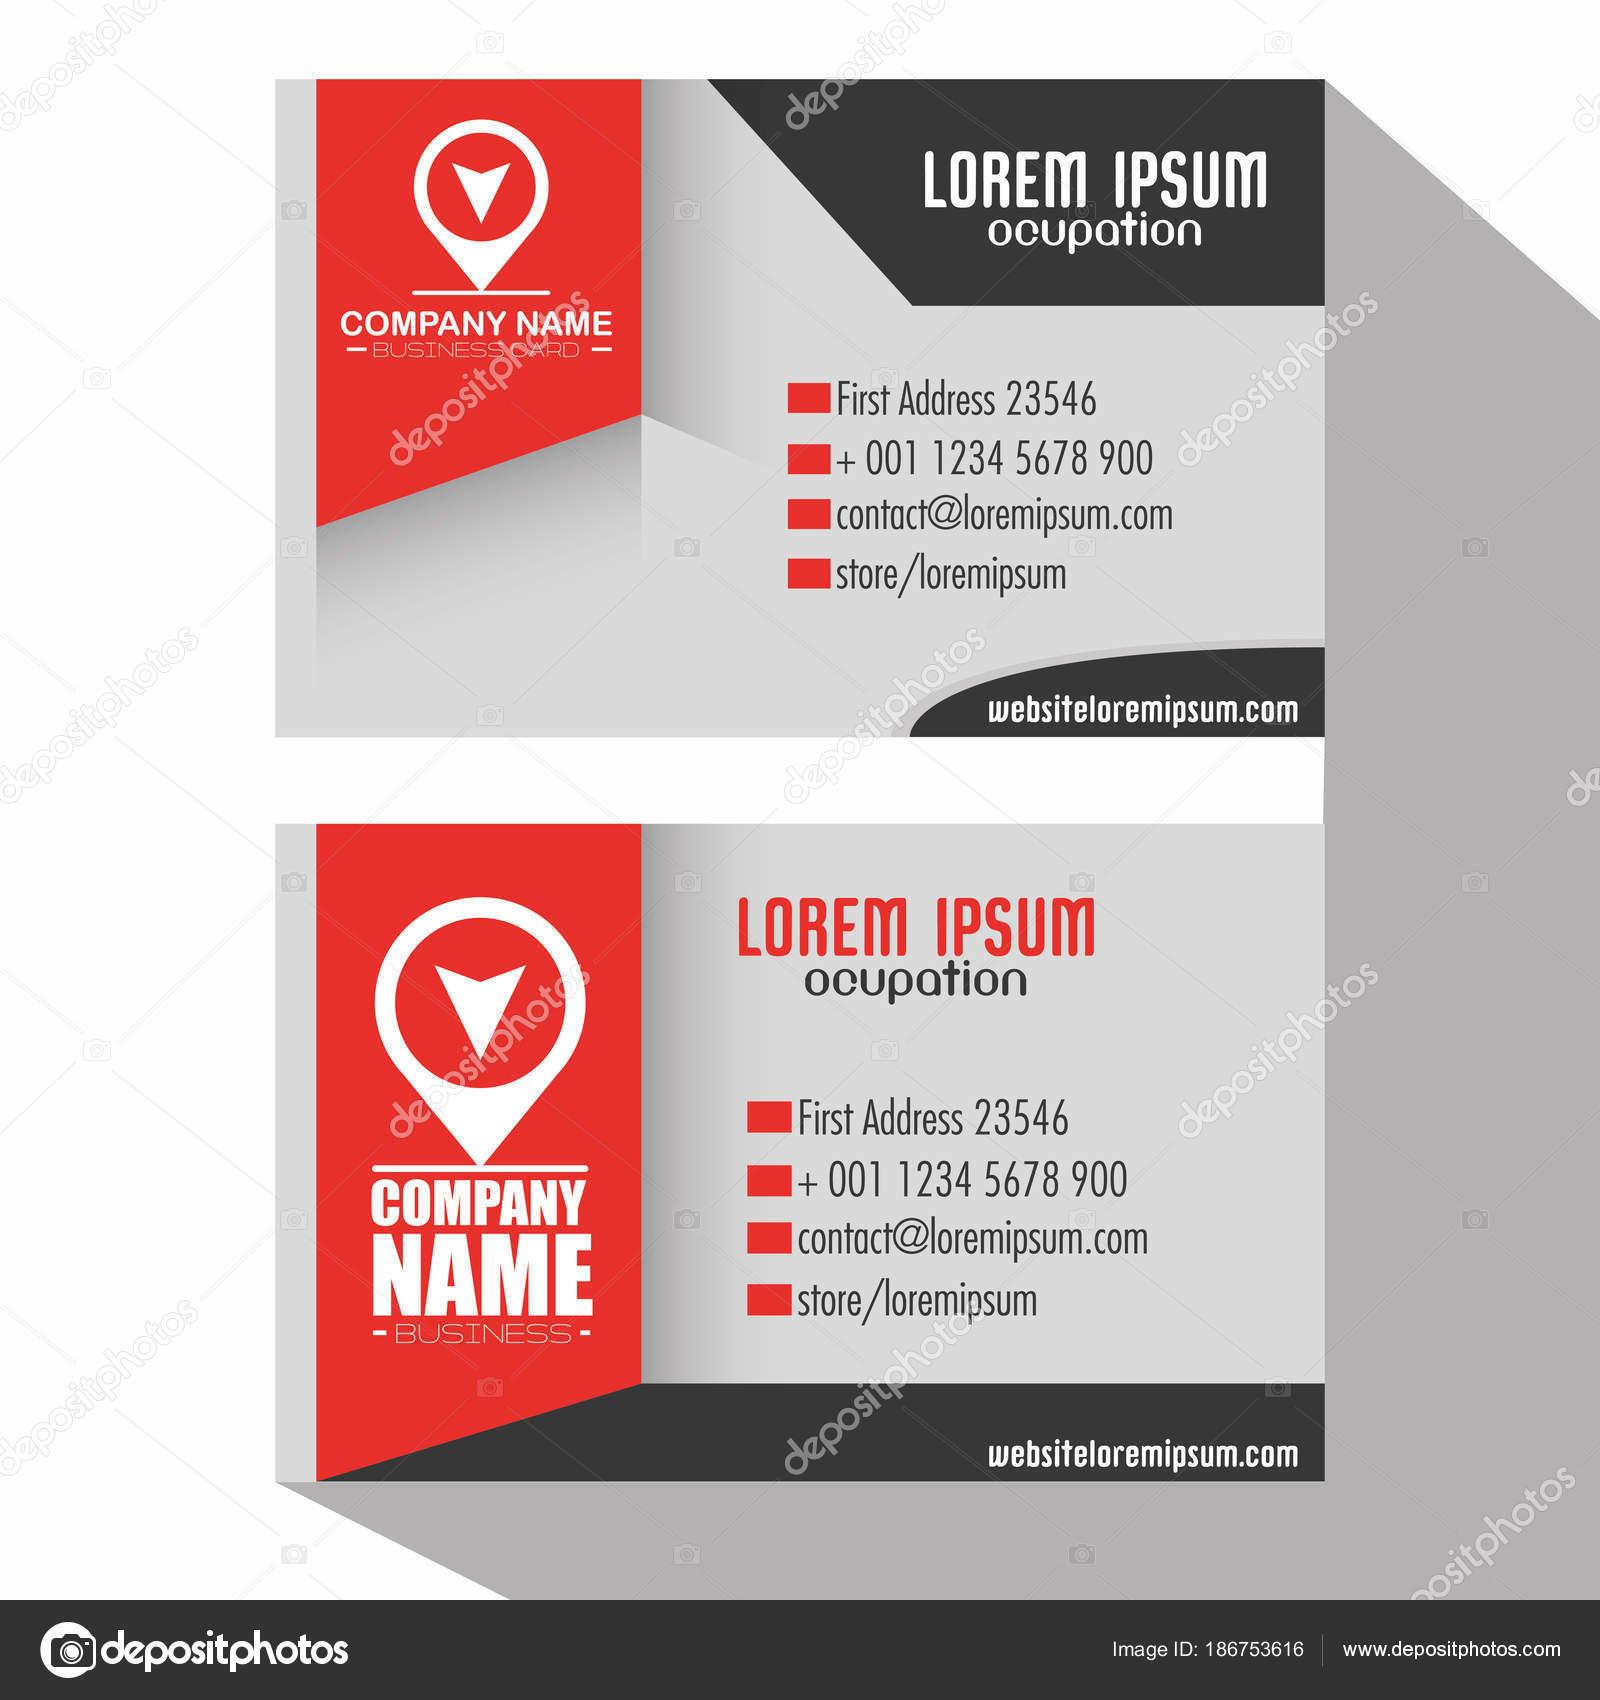 creative corporate business card templates — Stock Vector ...